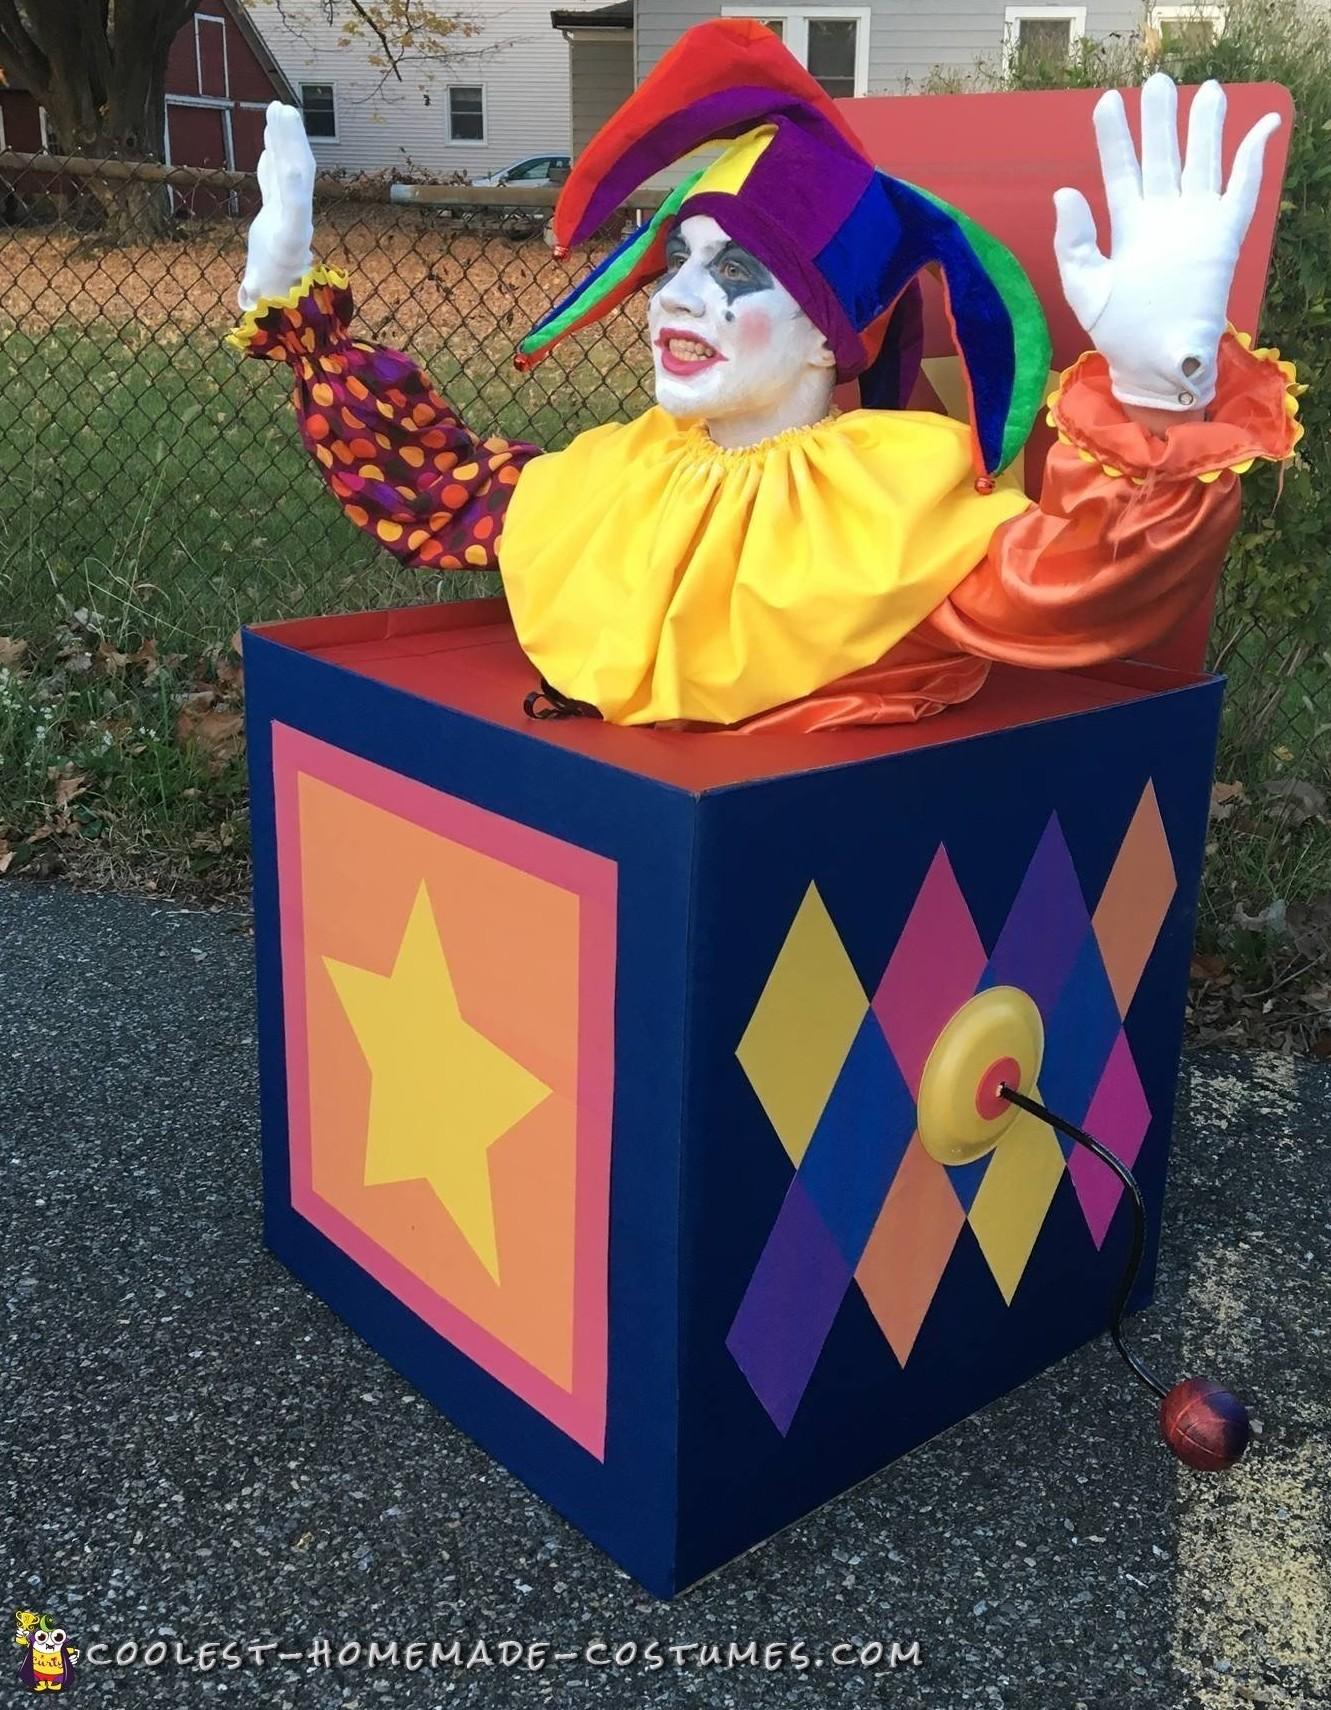 Amazing Homemade Jack in the Box Costume